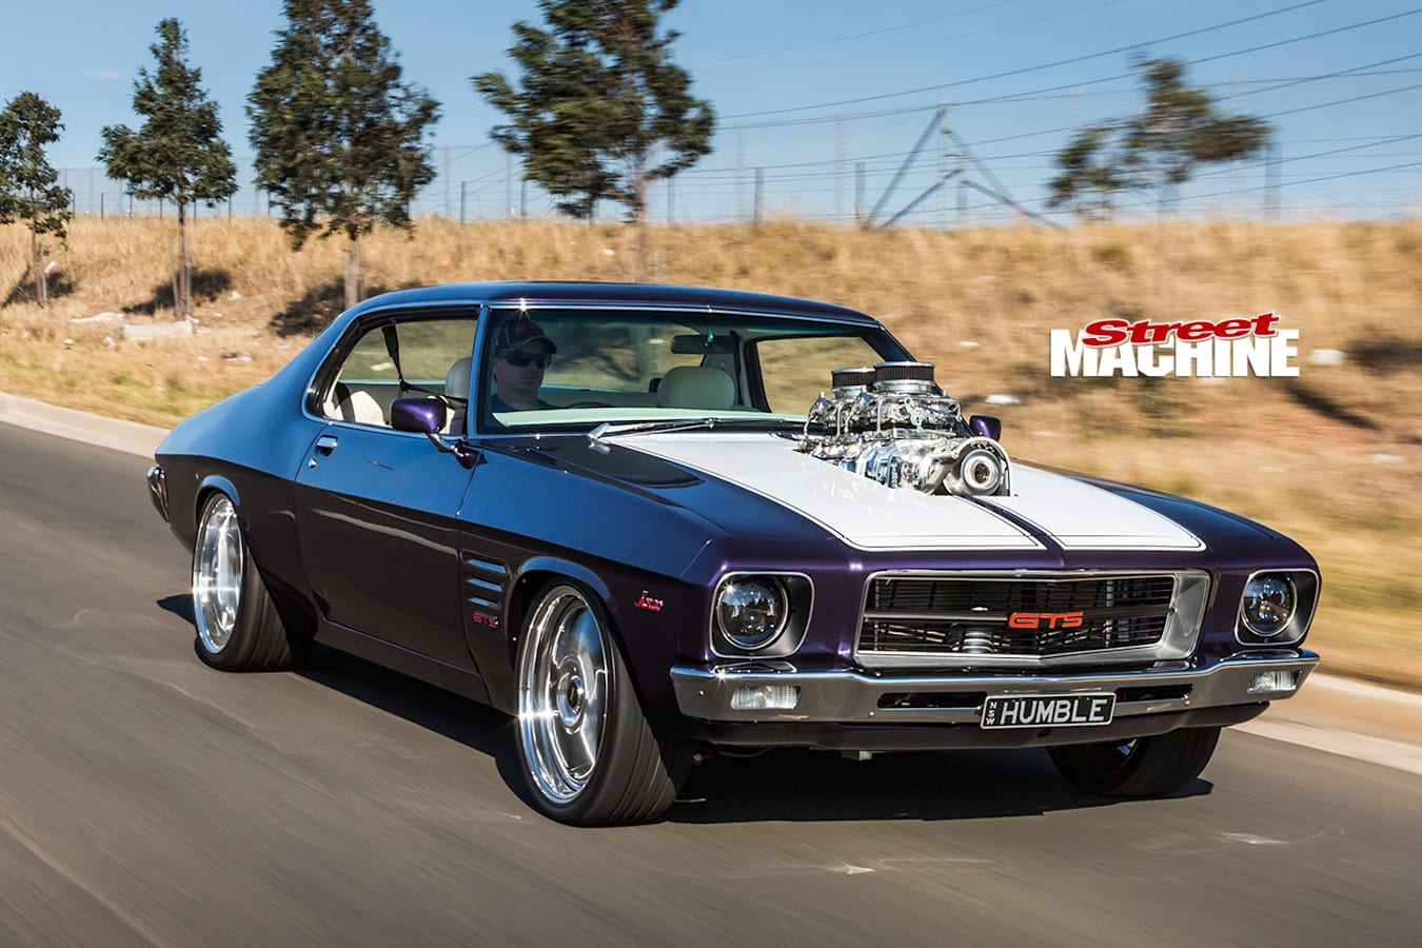 Holden HQ Monaro GTS onroad